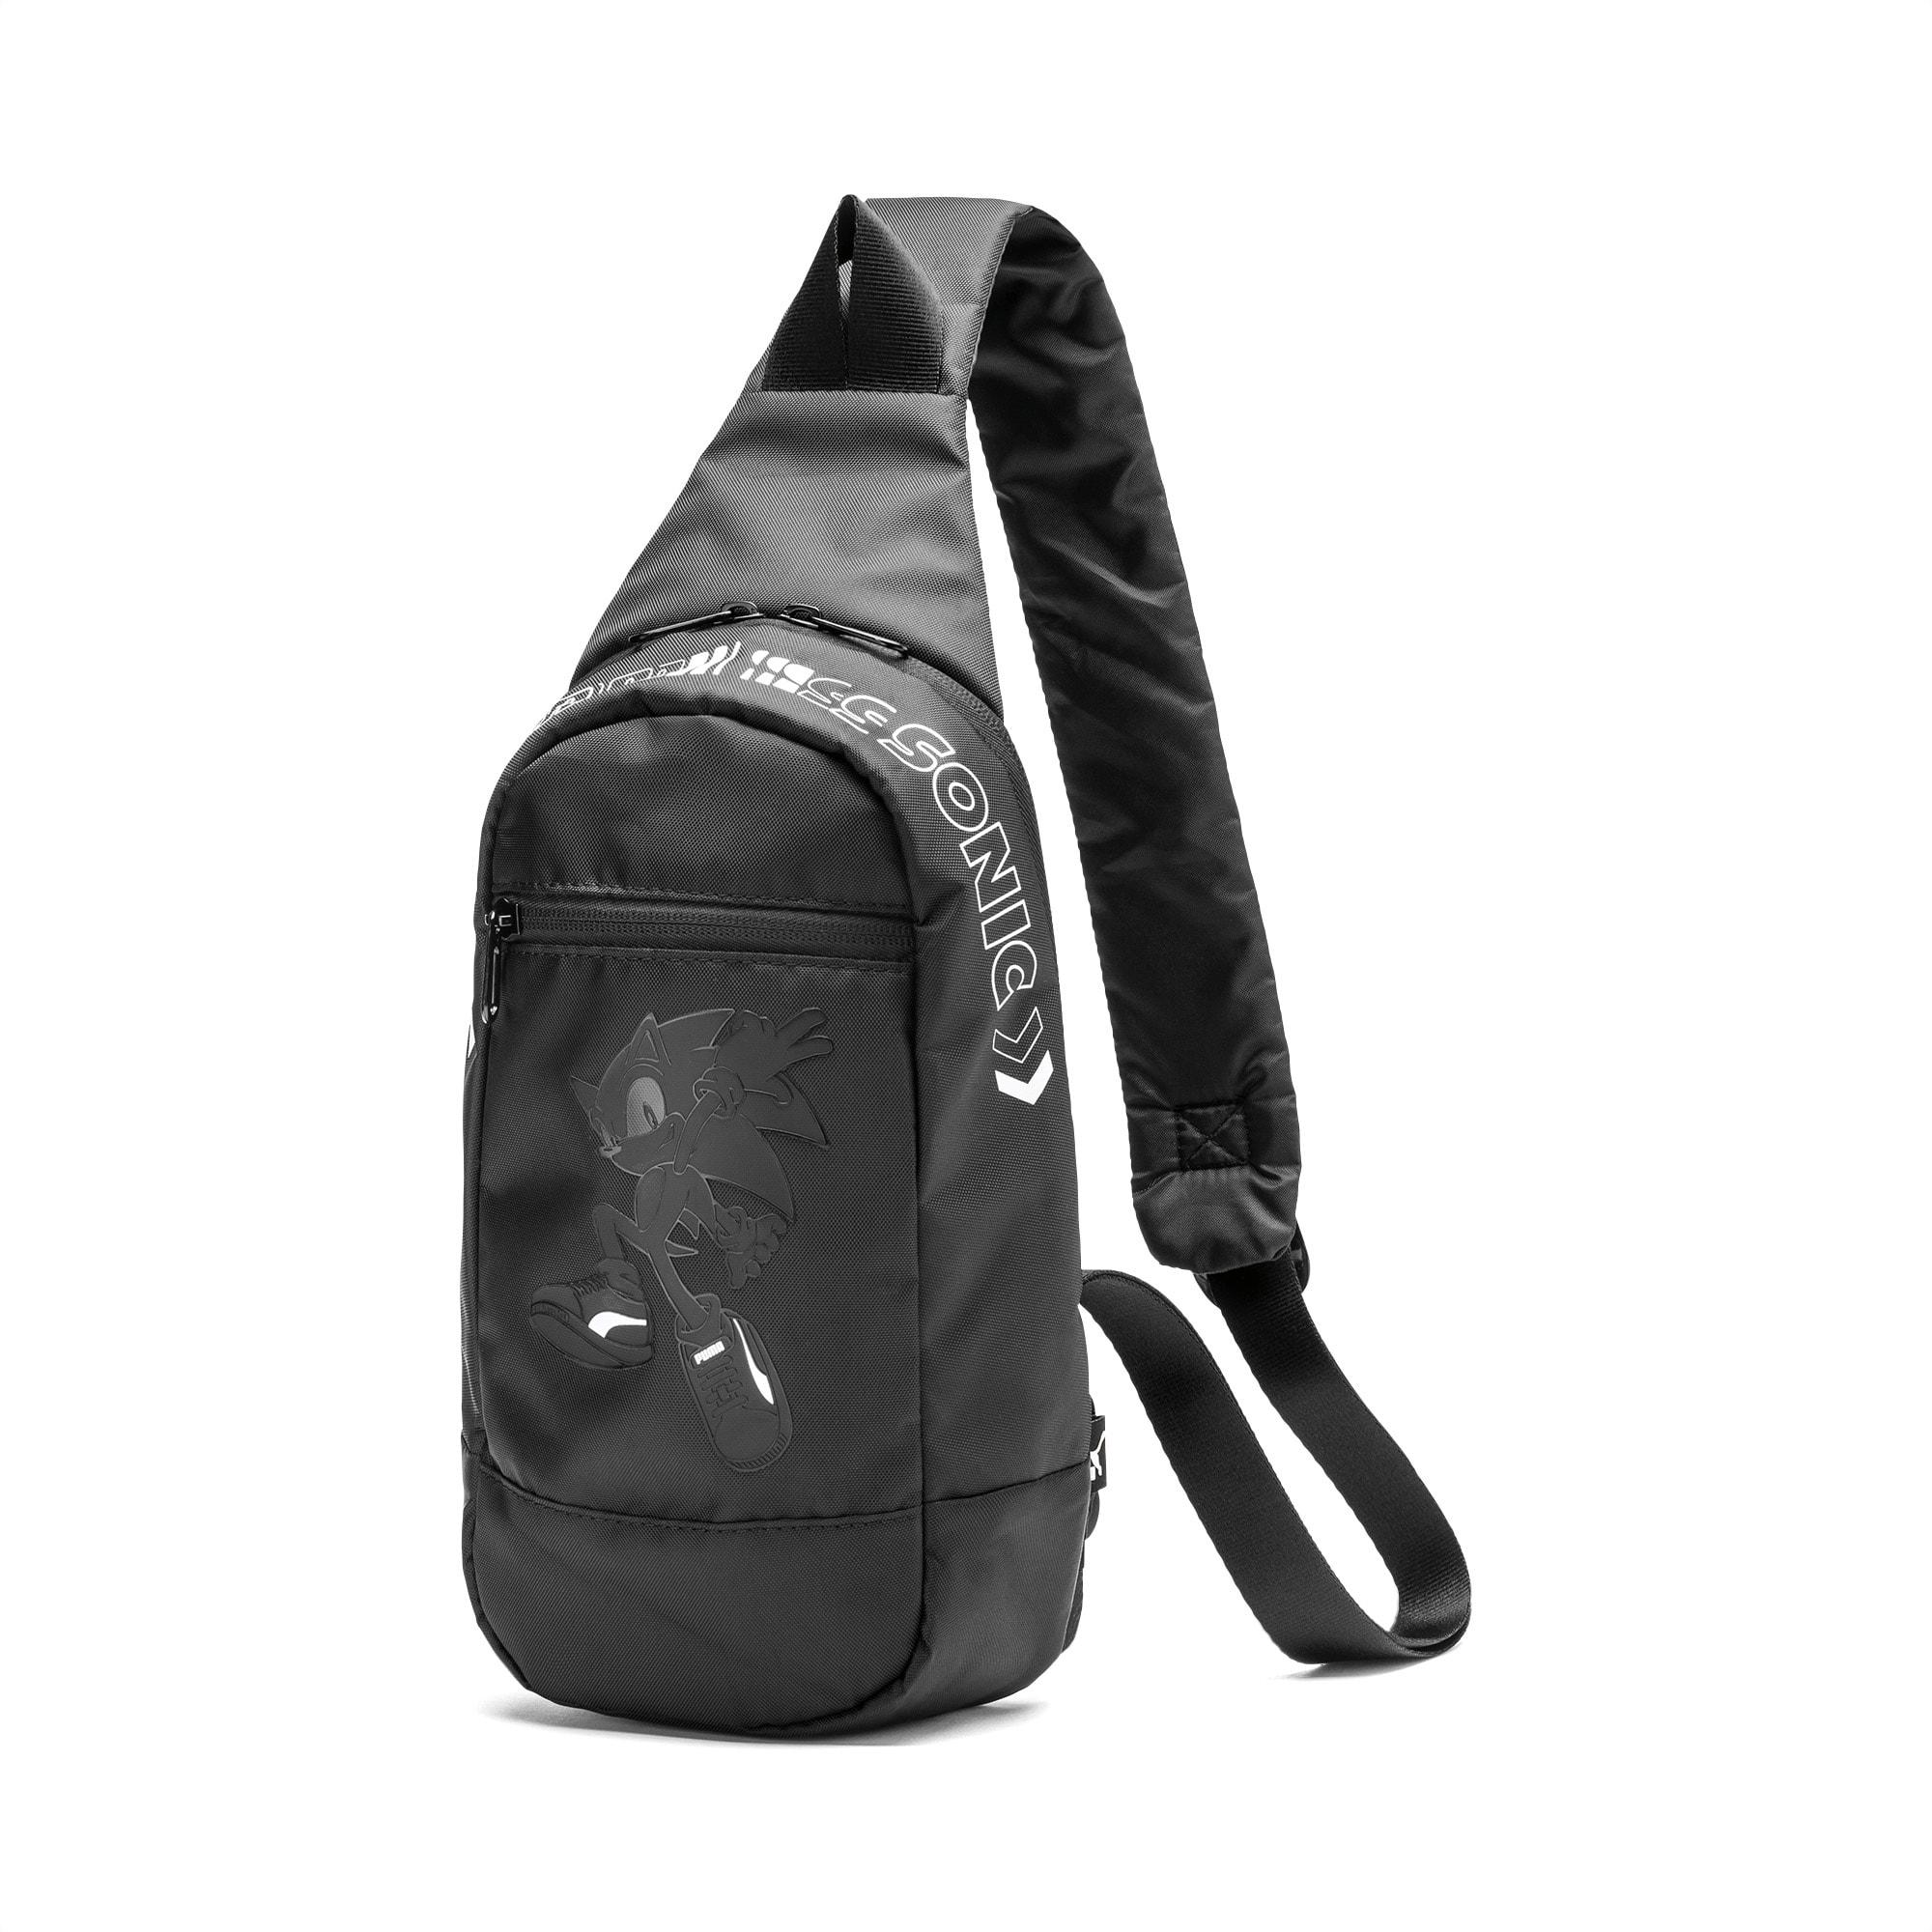 PUMA x ODIN Cross Body Bag | Puma White Puma Black | PUMA